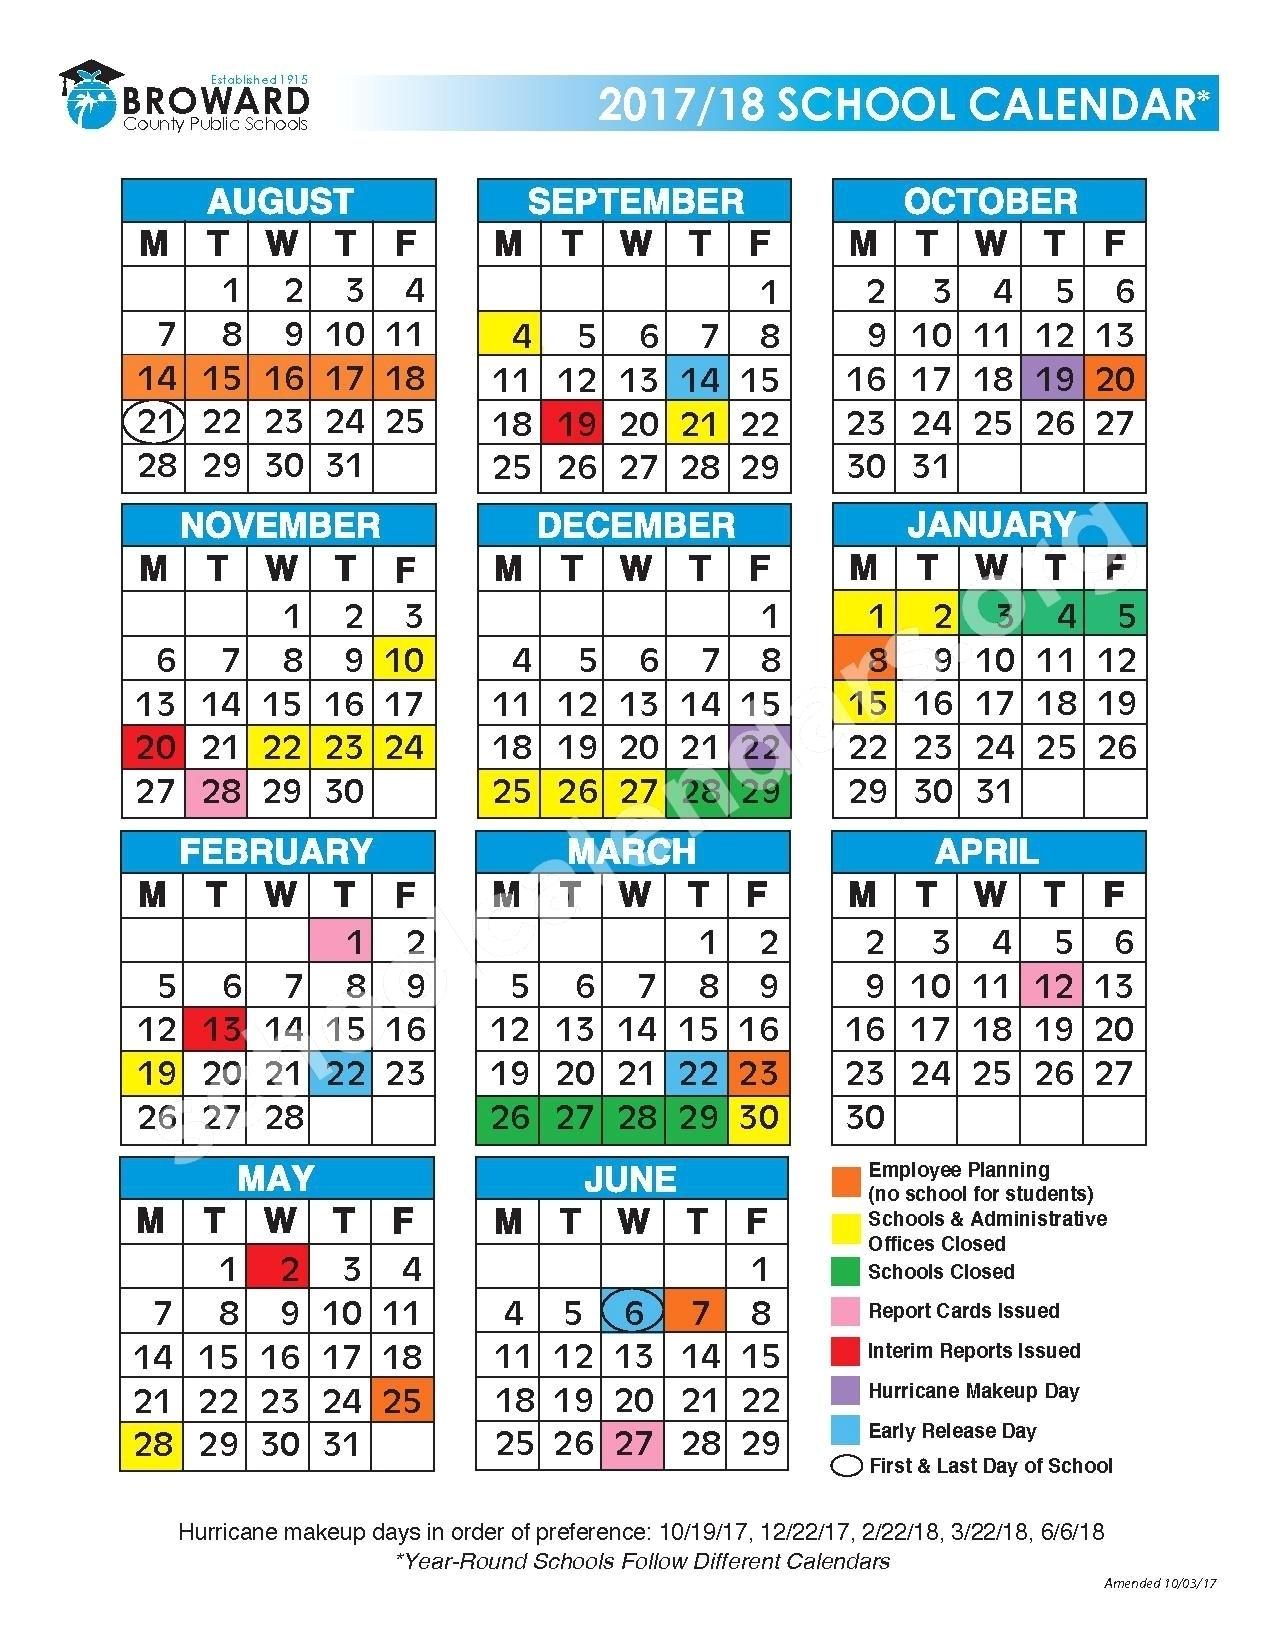 Broward School Calendar 2019 To 2019 2017 2018 District Calendar | Isacl_Calendar School 2020 Broward